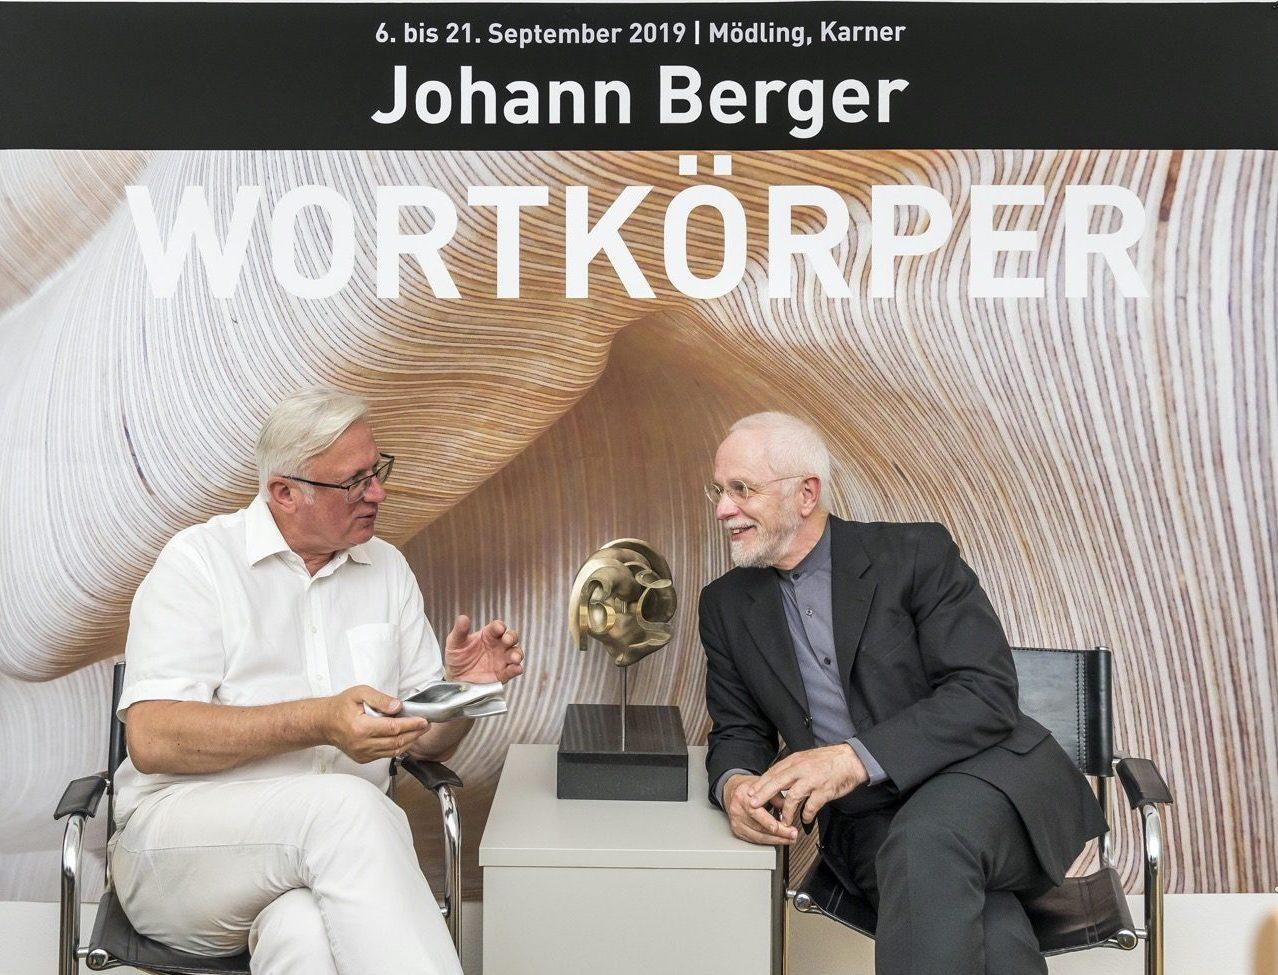 Johann Berger - Wortkörper im Karner 2019